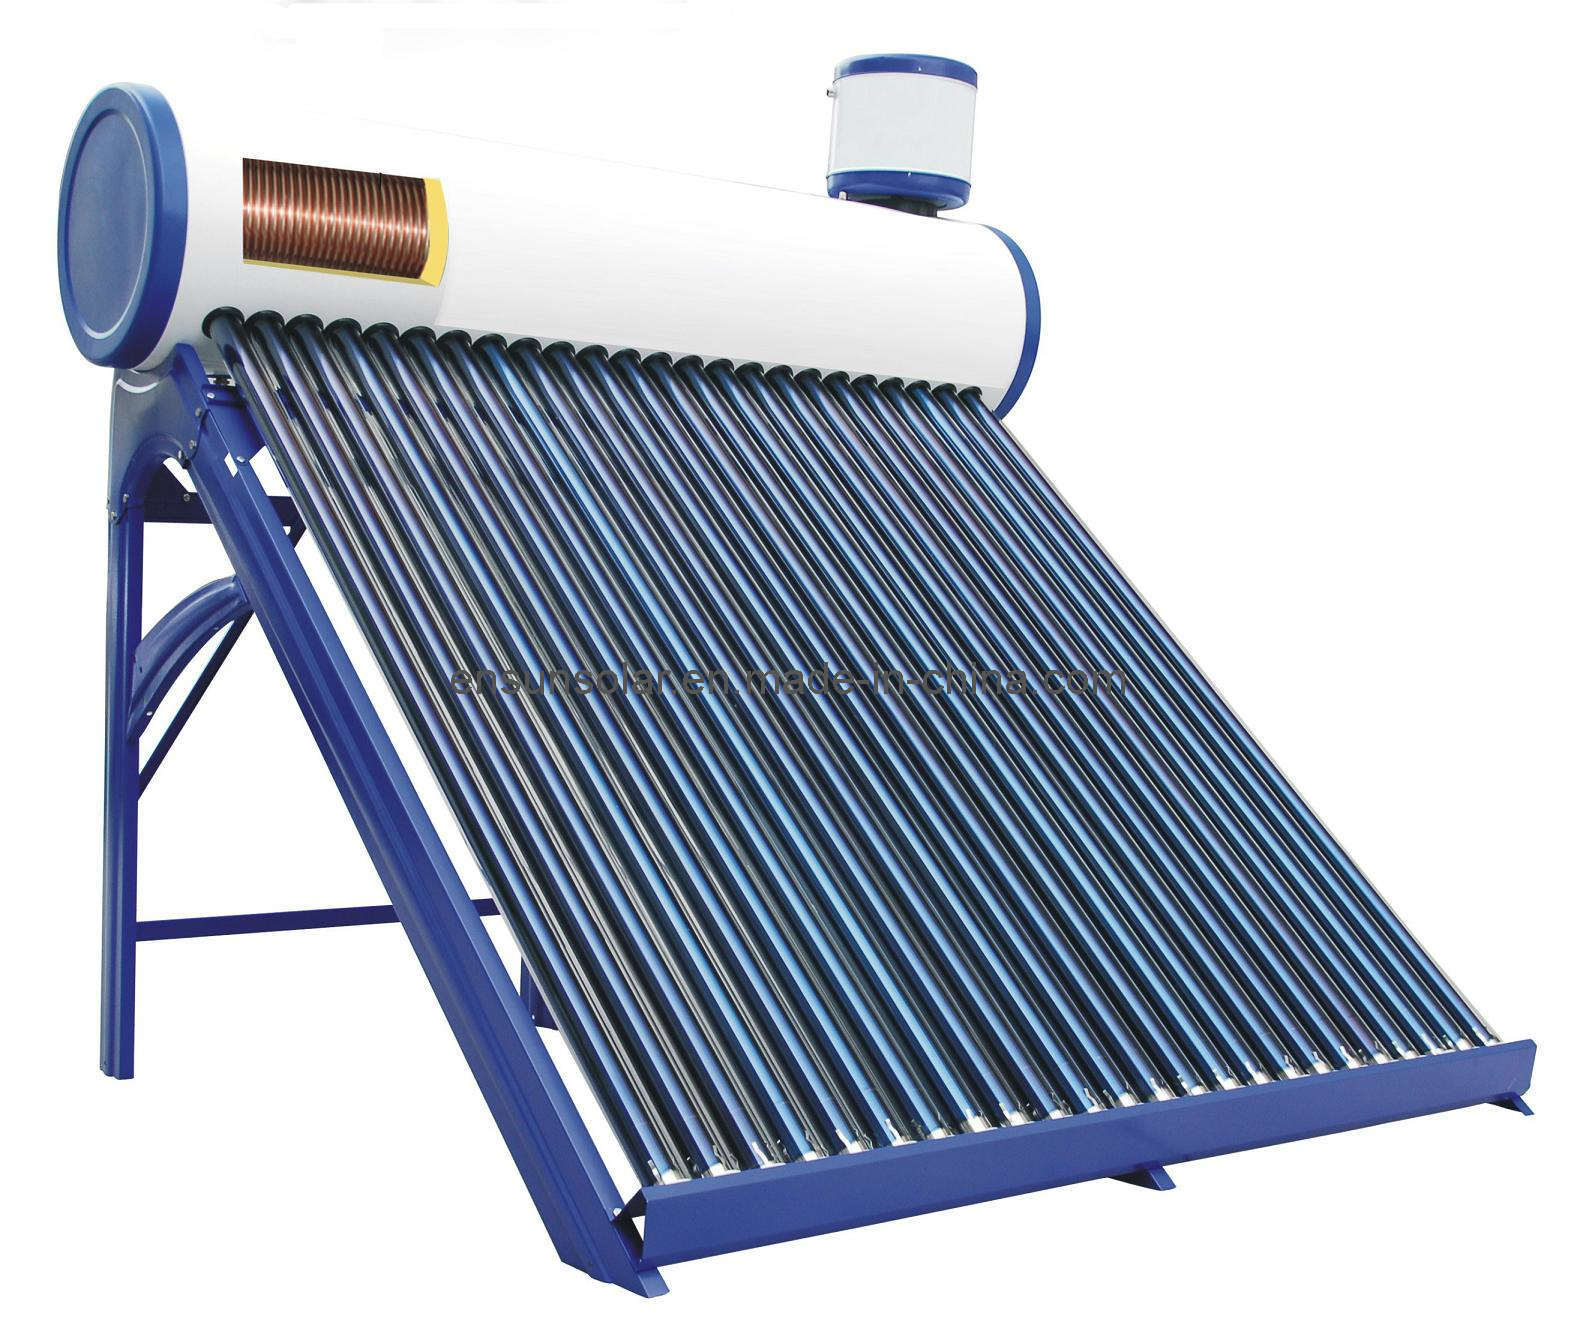 China Pre Heating Solar Water Heater Ensun Phs China